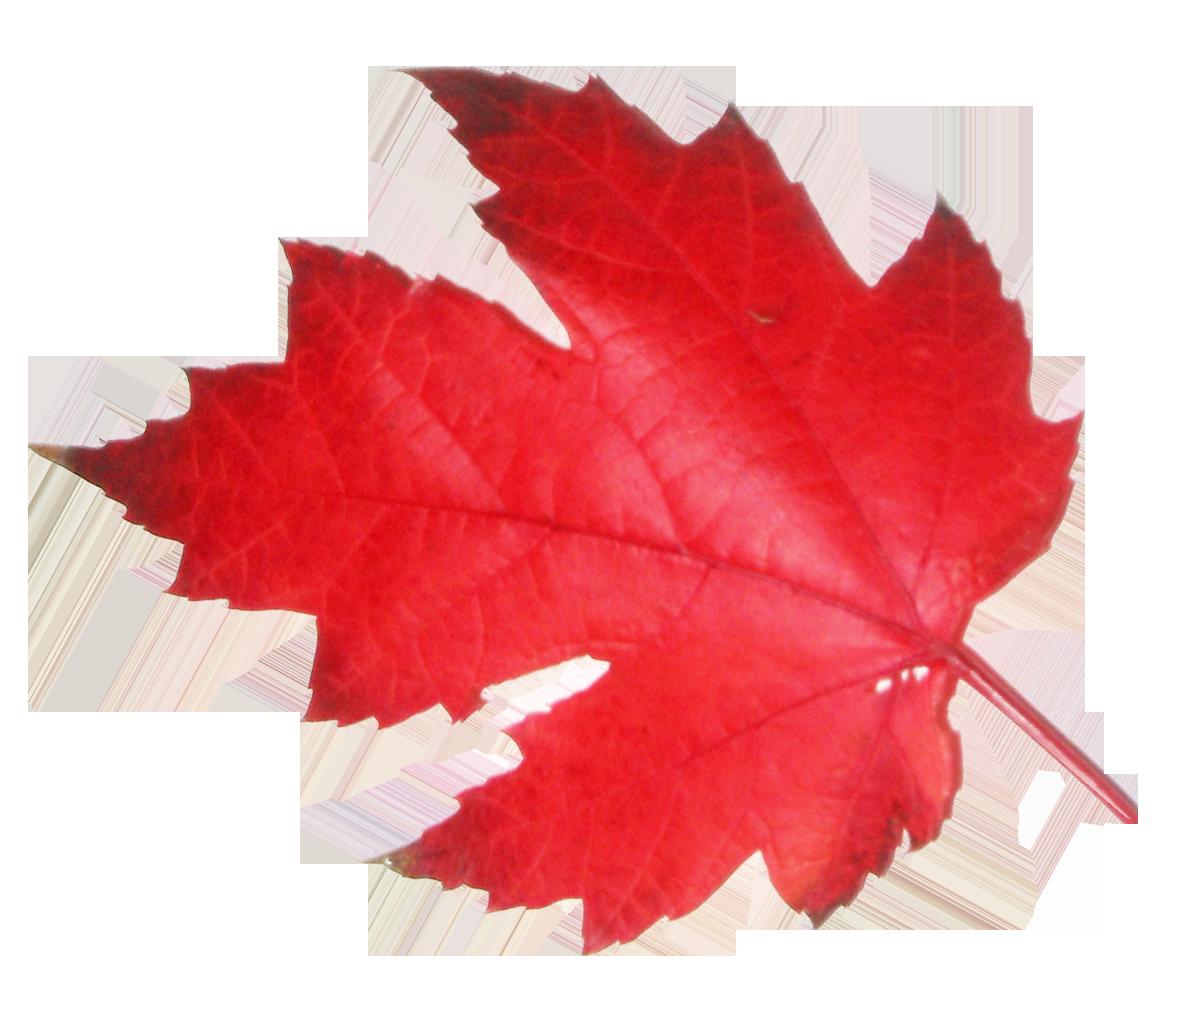 red Leaf PNG Image - PurePNG | Free transparent CC0 PNG ...